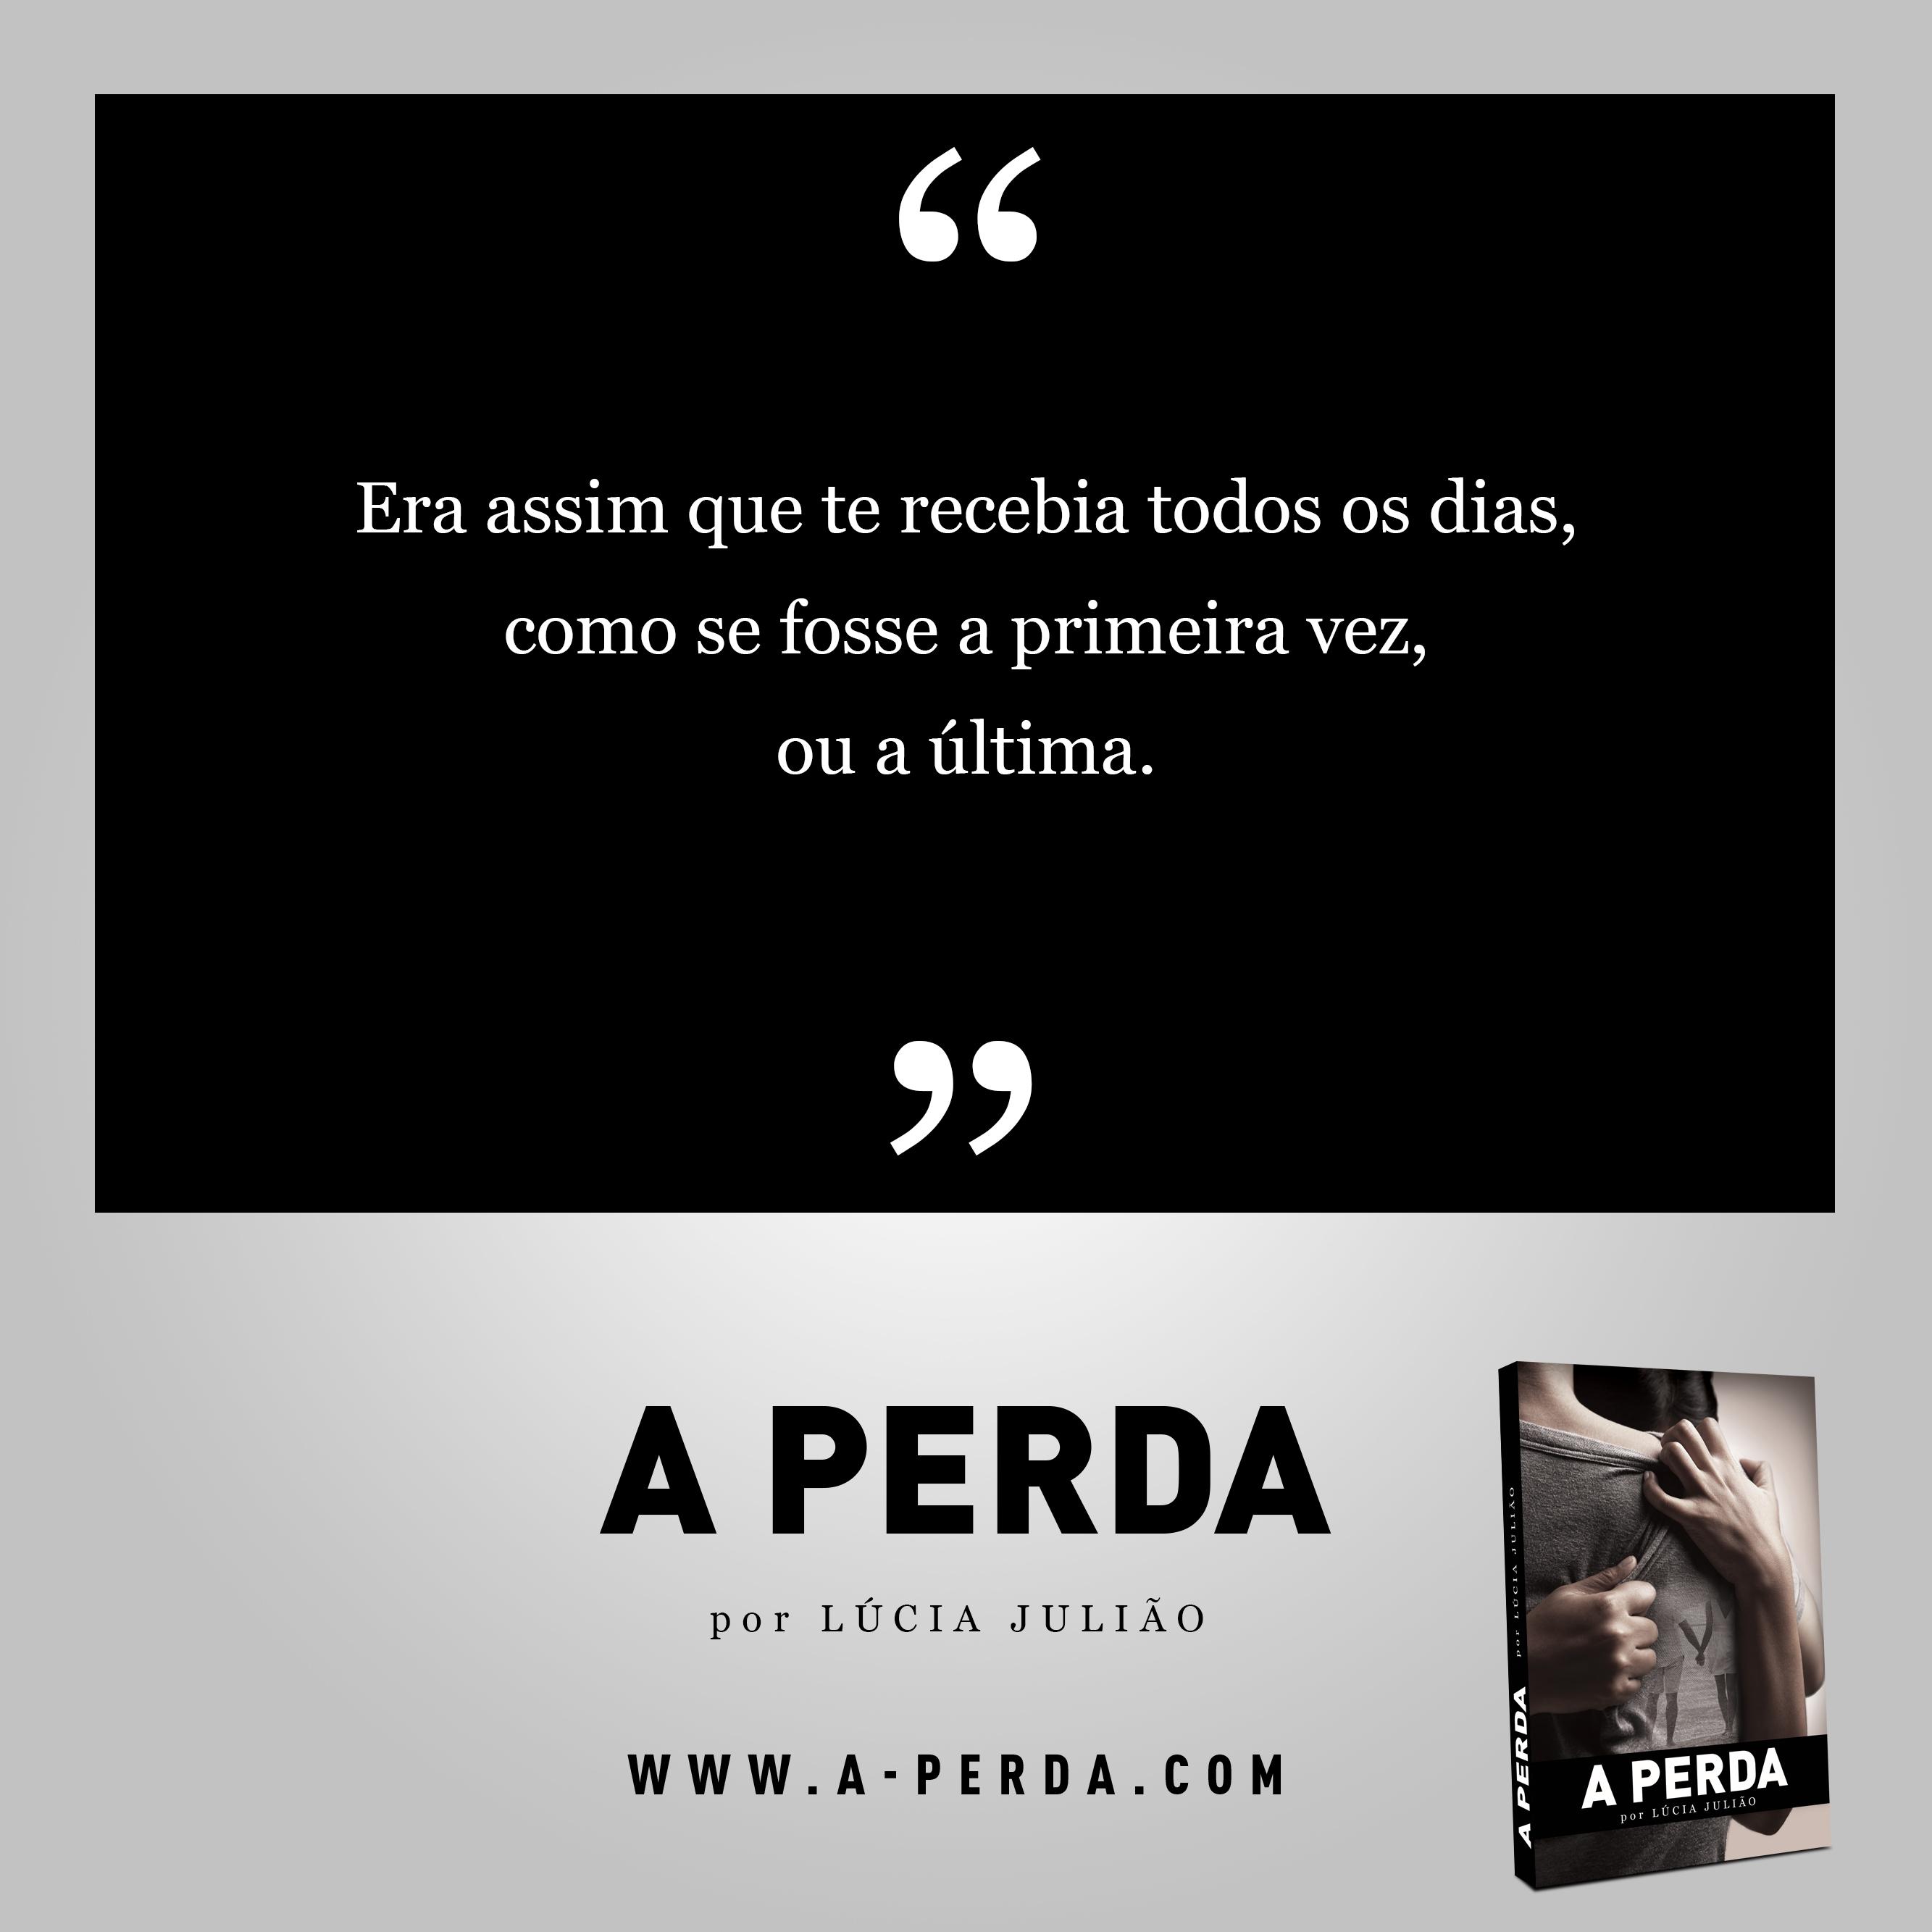 032-capitulo-32-livro-a-Perda-de-Lucia-Juliao-Instagram